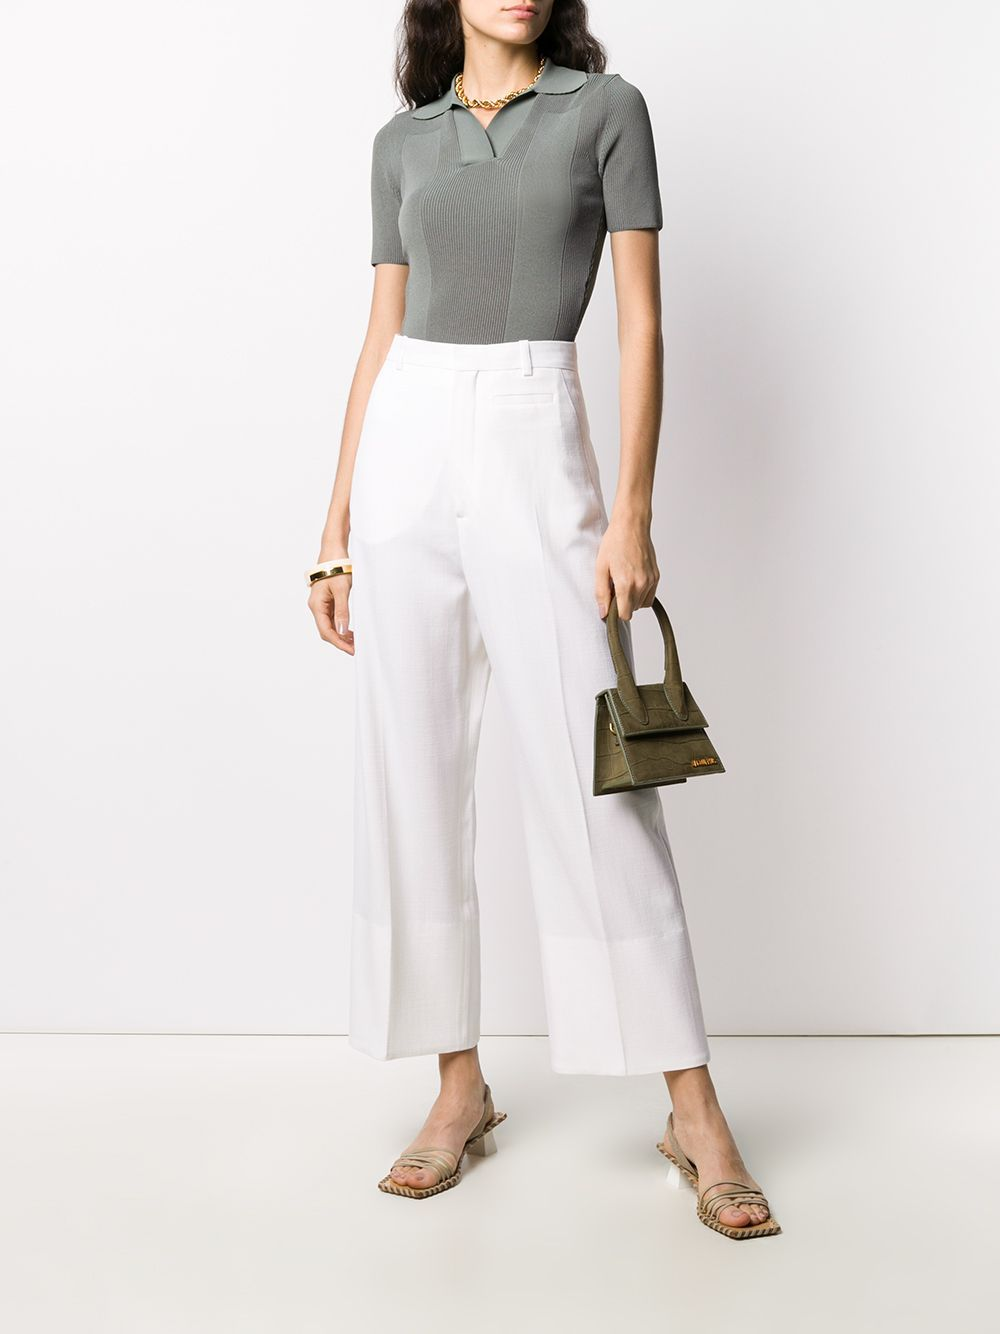 White wool-blend high-waisted wide-leg trousers featuring high waist JACQUEMUS |  | 203PA04-120110